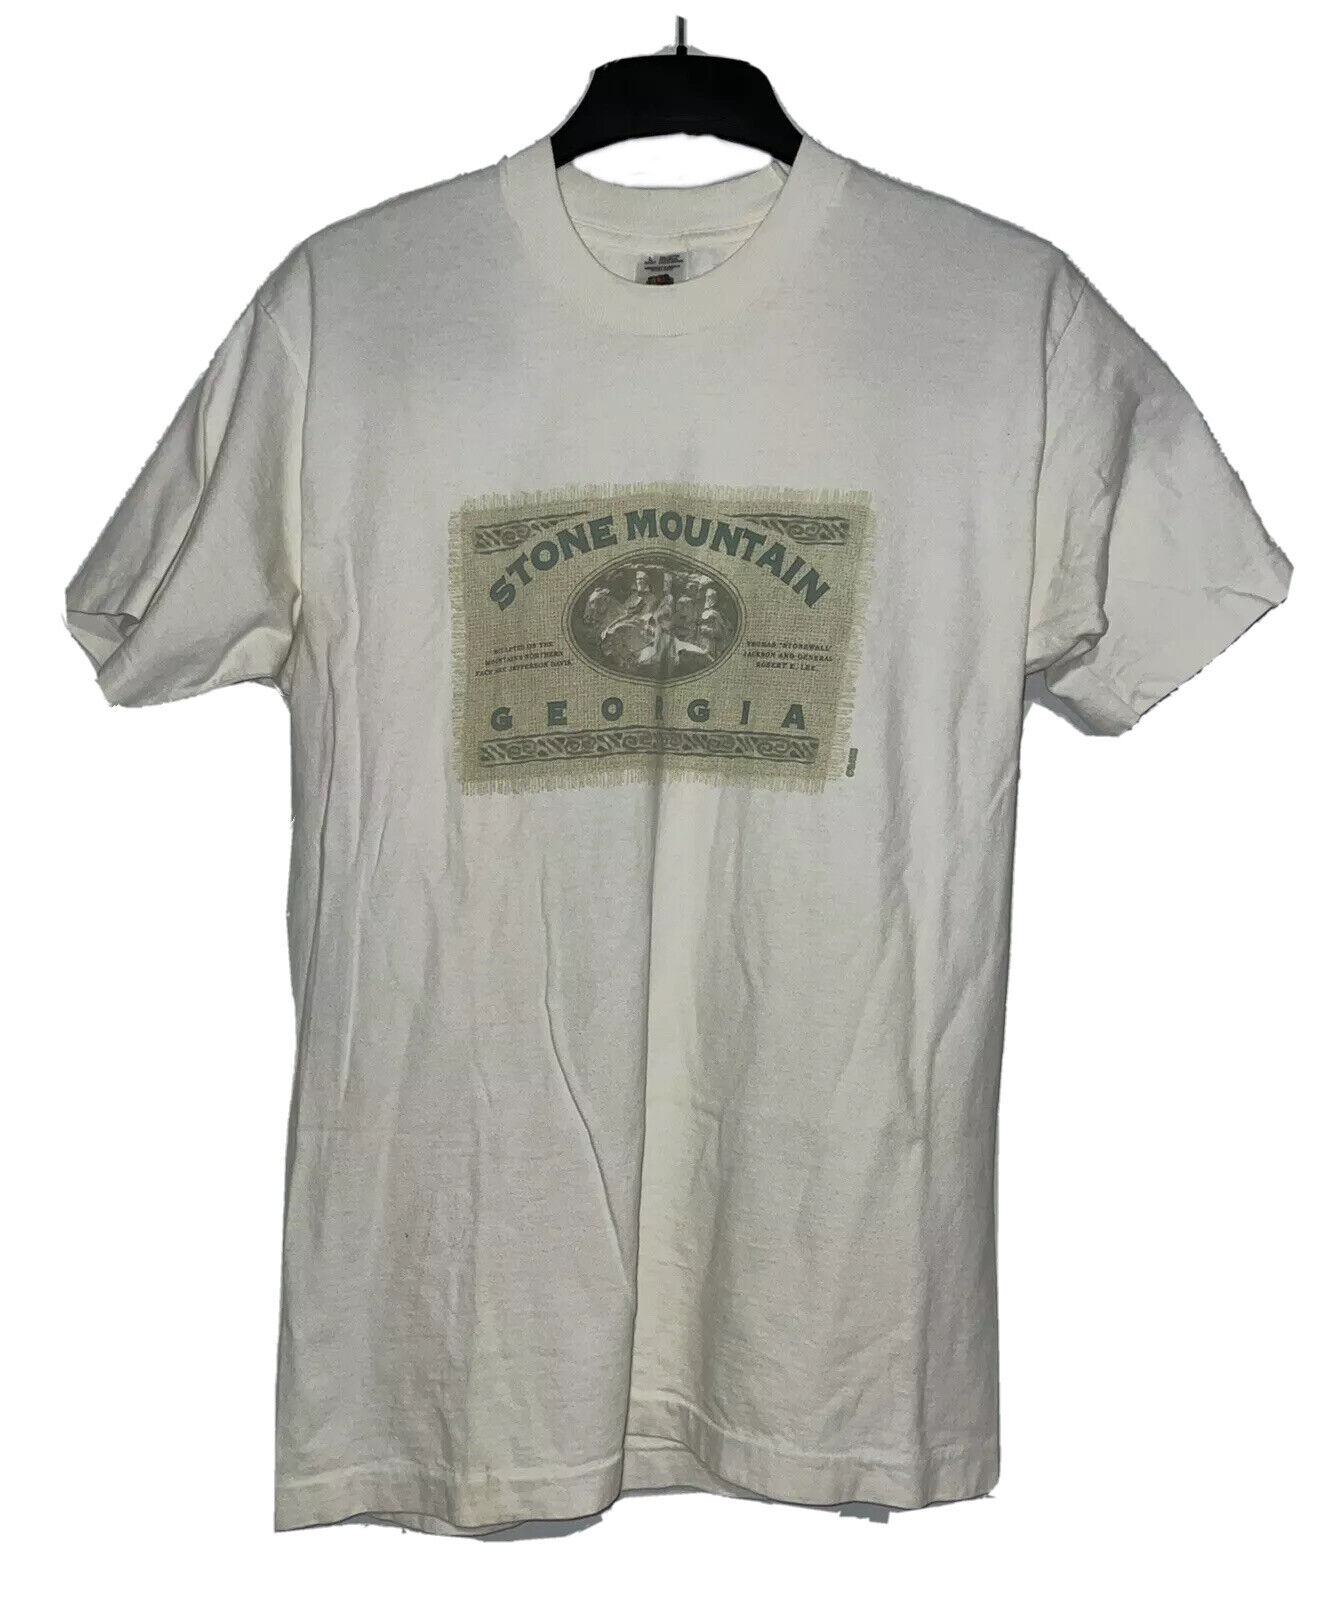 Vintage 90s Stone Mountain Shirt XL Atlanta Georgia National Park Outdoor Adventure X Large TShirt